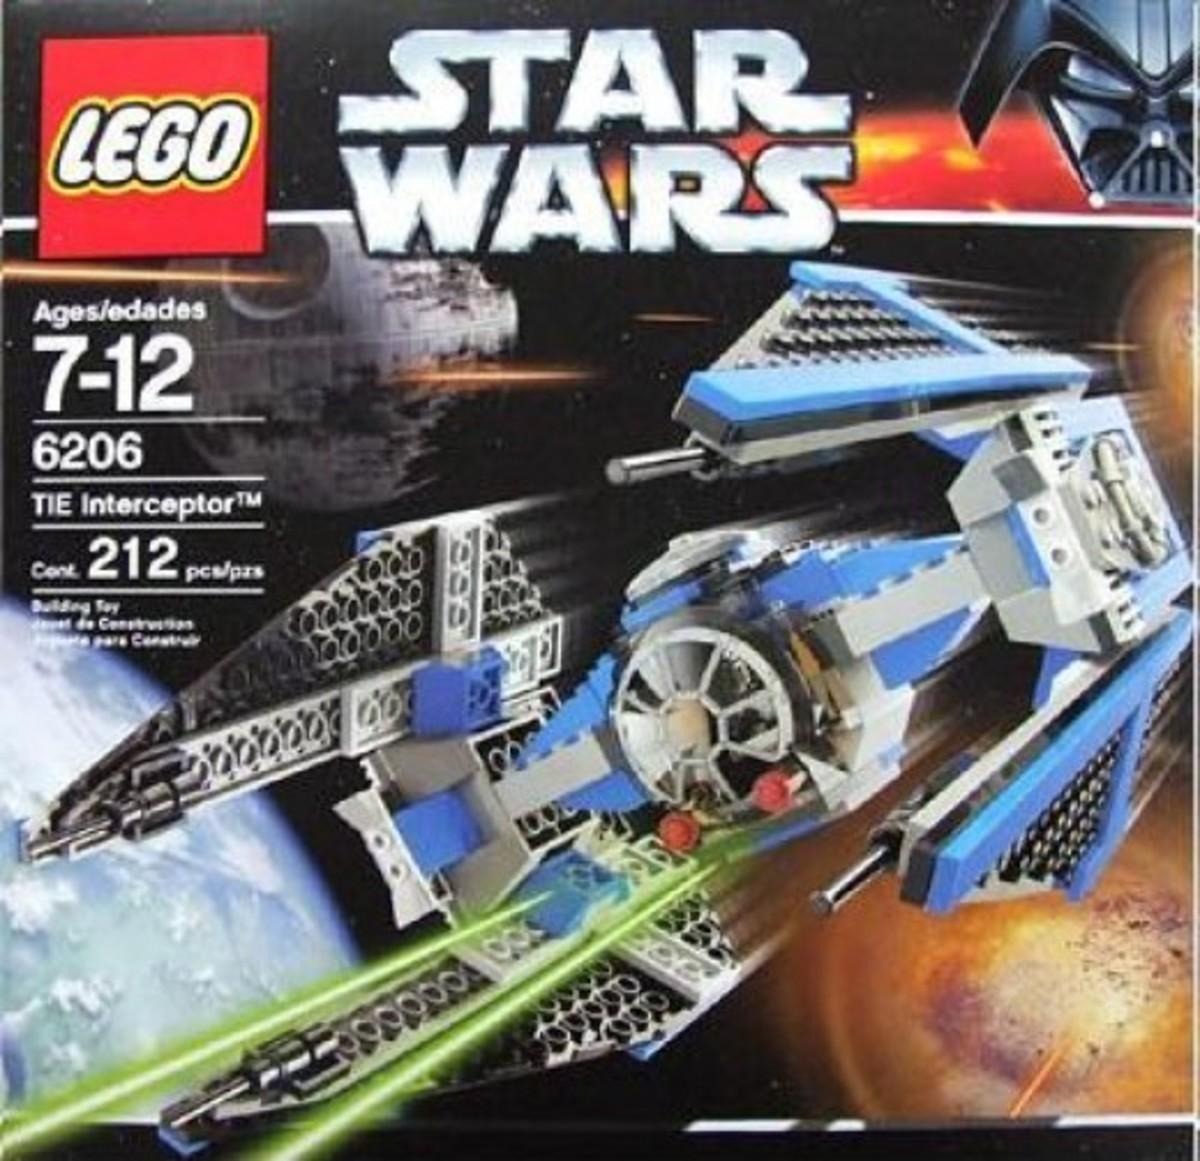 Lego Star Wars TIE Interceptor 6206 Box